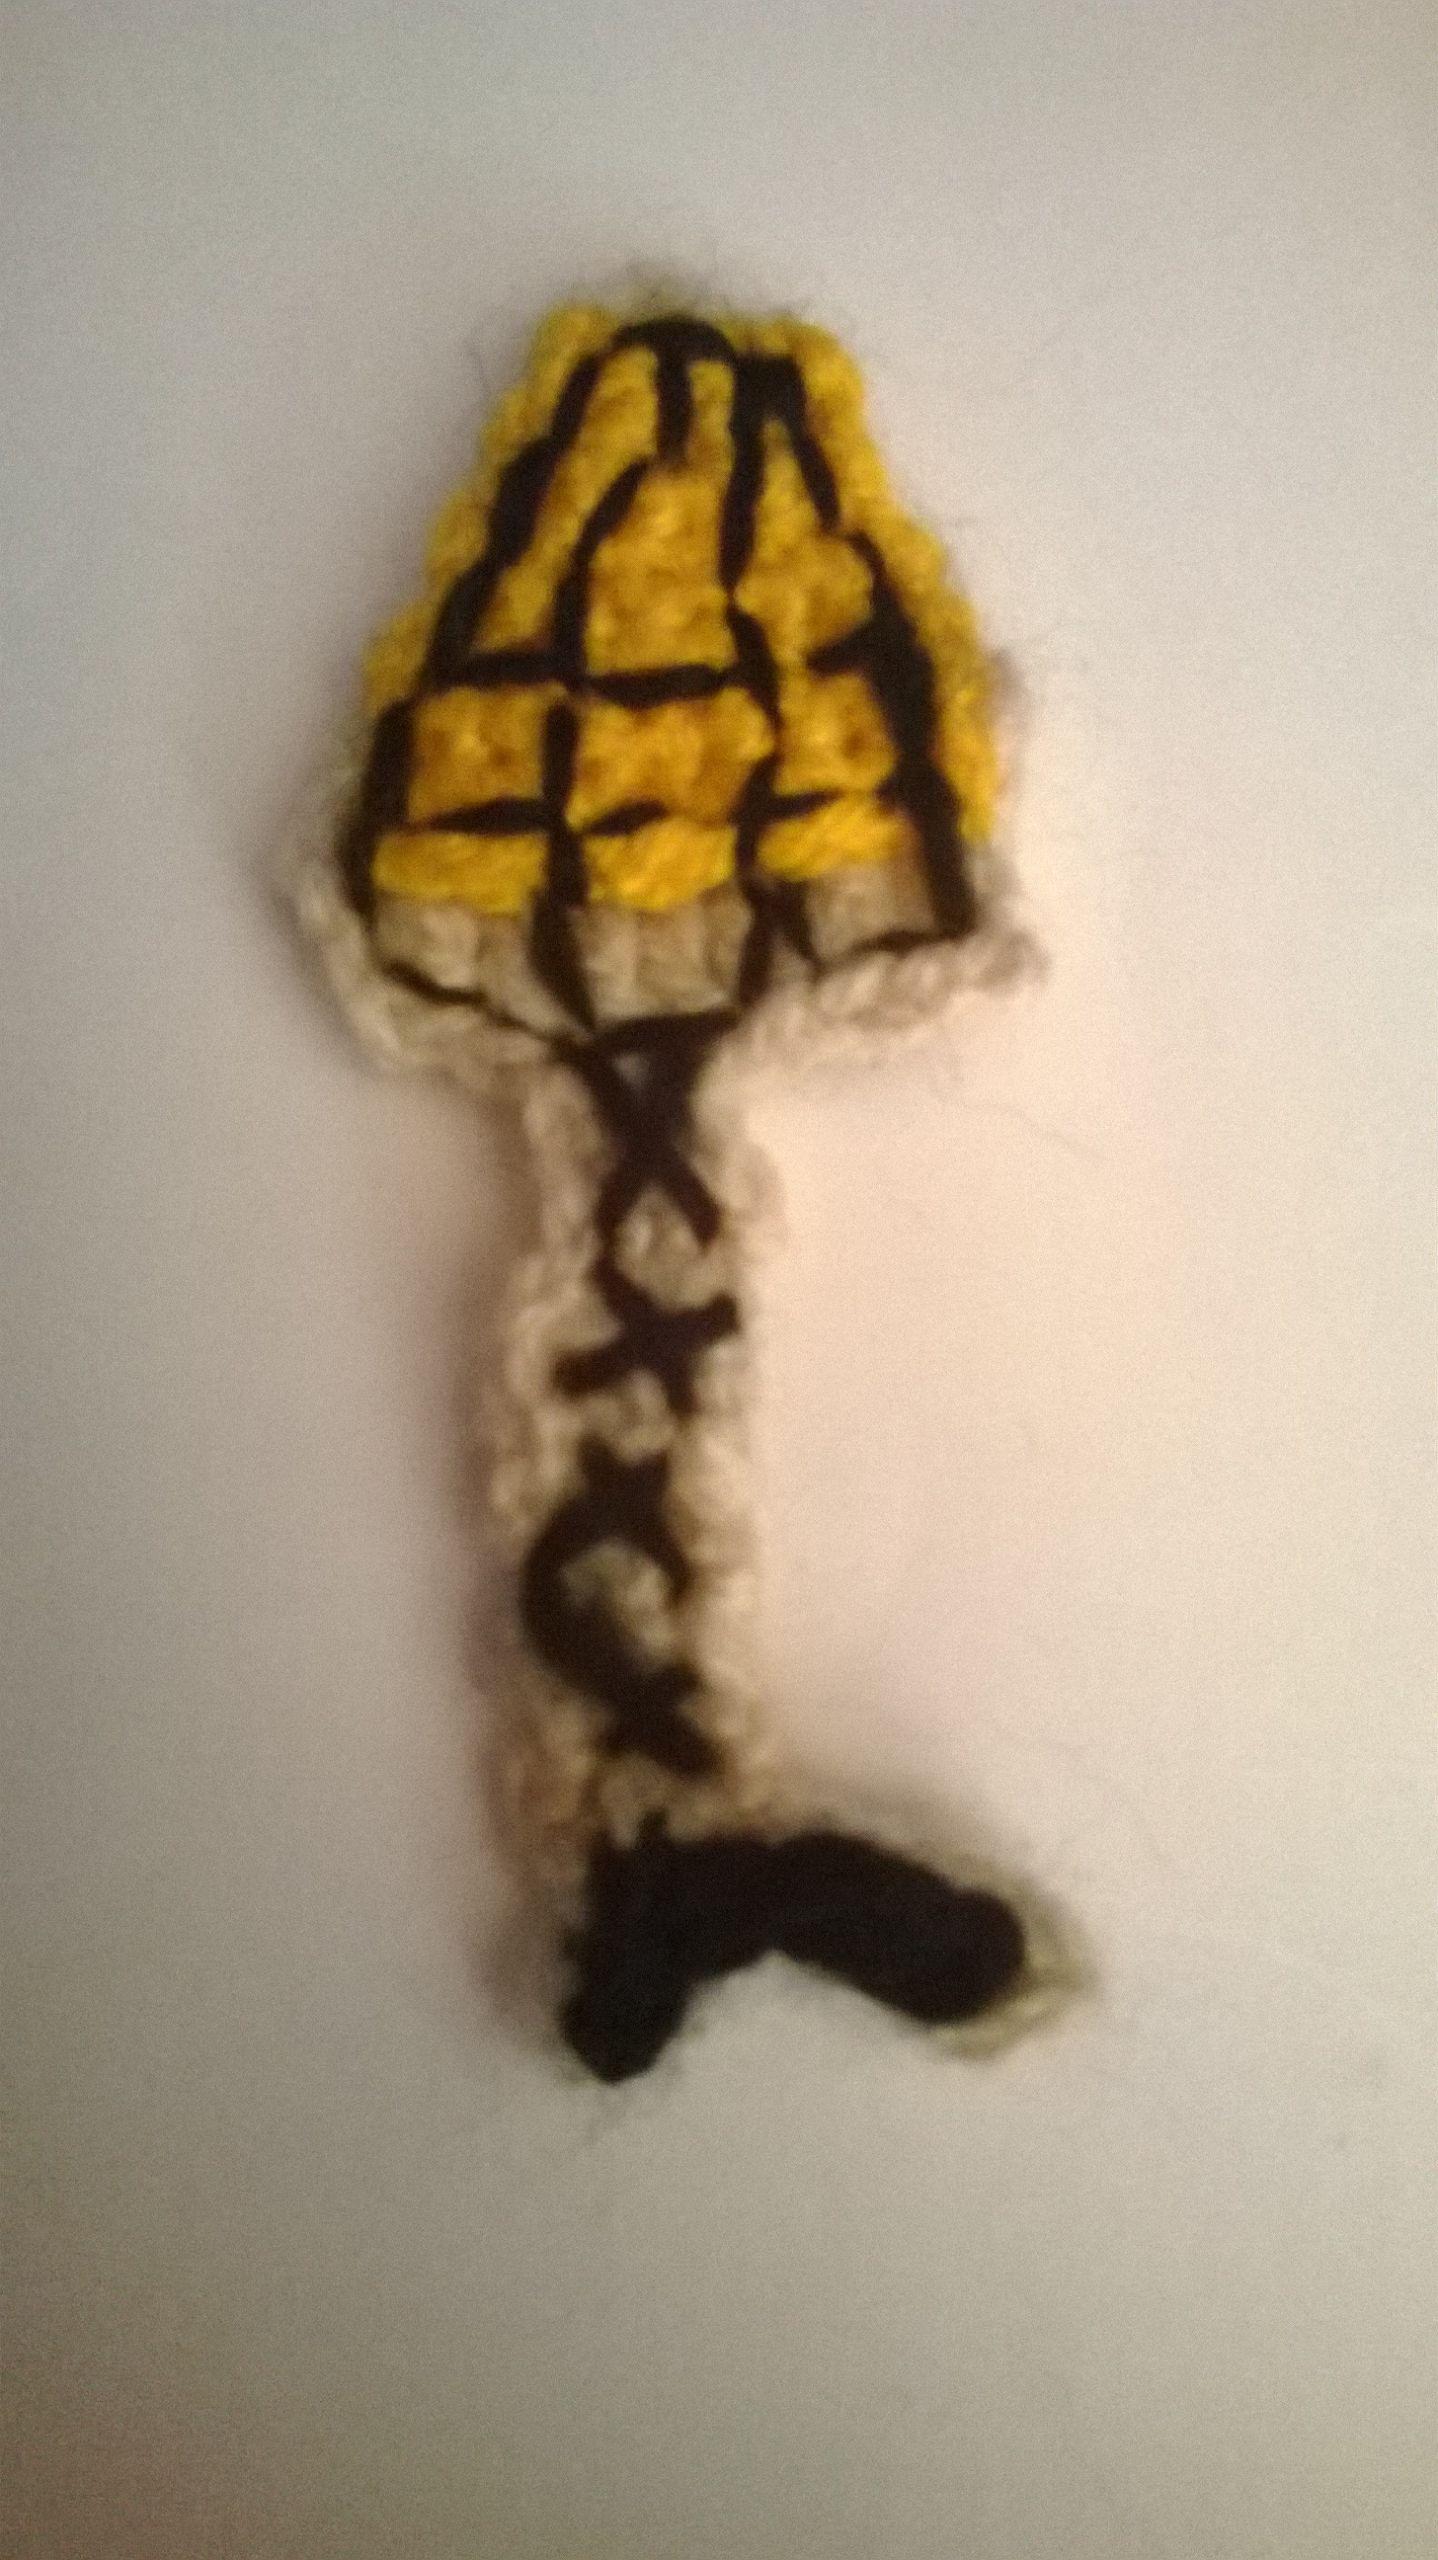 Christmas Story Leg Lamp Cookies  Crocheted leg lamp cookie